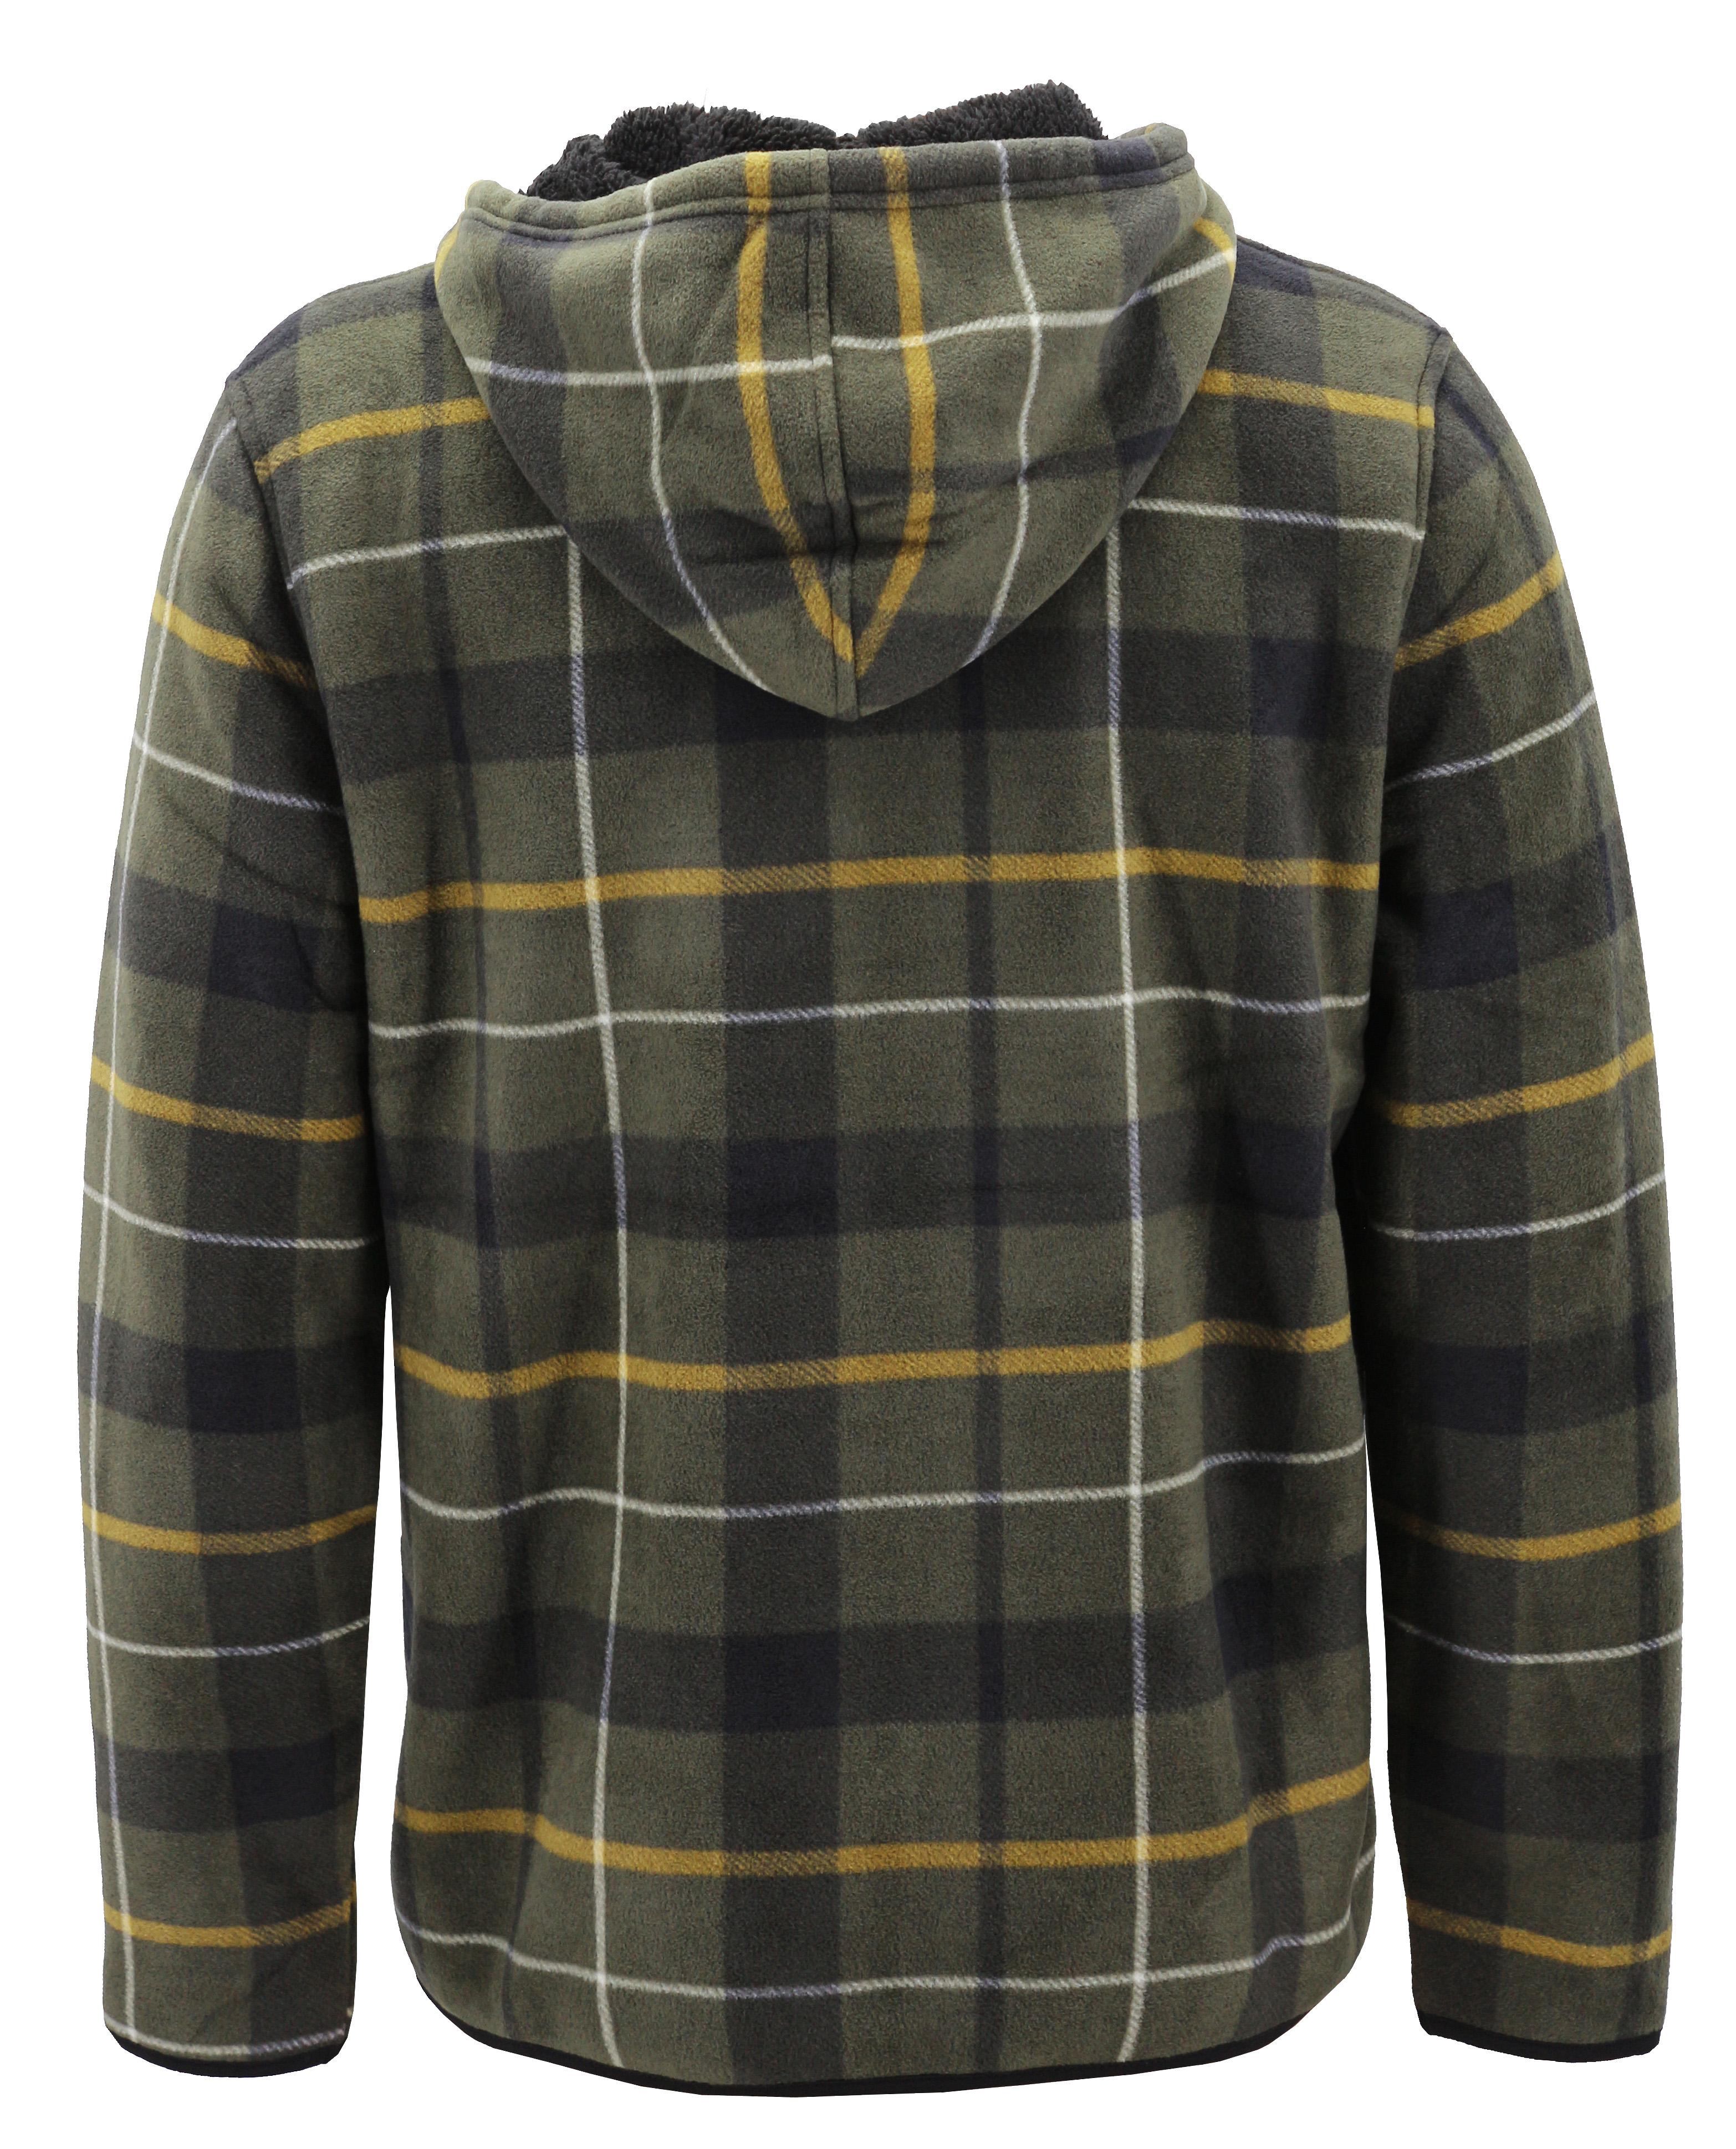 thumbnail 12 - Men-039-s-Casual-Flannel-Zip-Up-Fleece-Lined-Plaid-Sherpa-Hoodie-Lightweight-Jacket